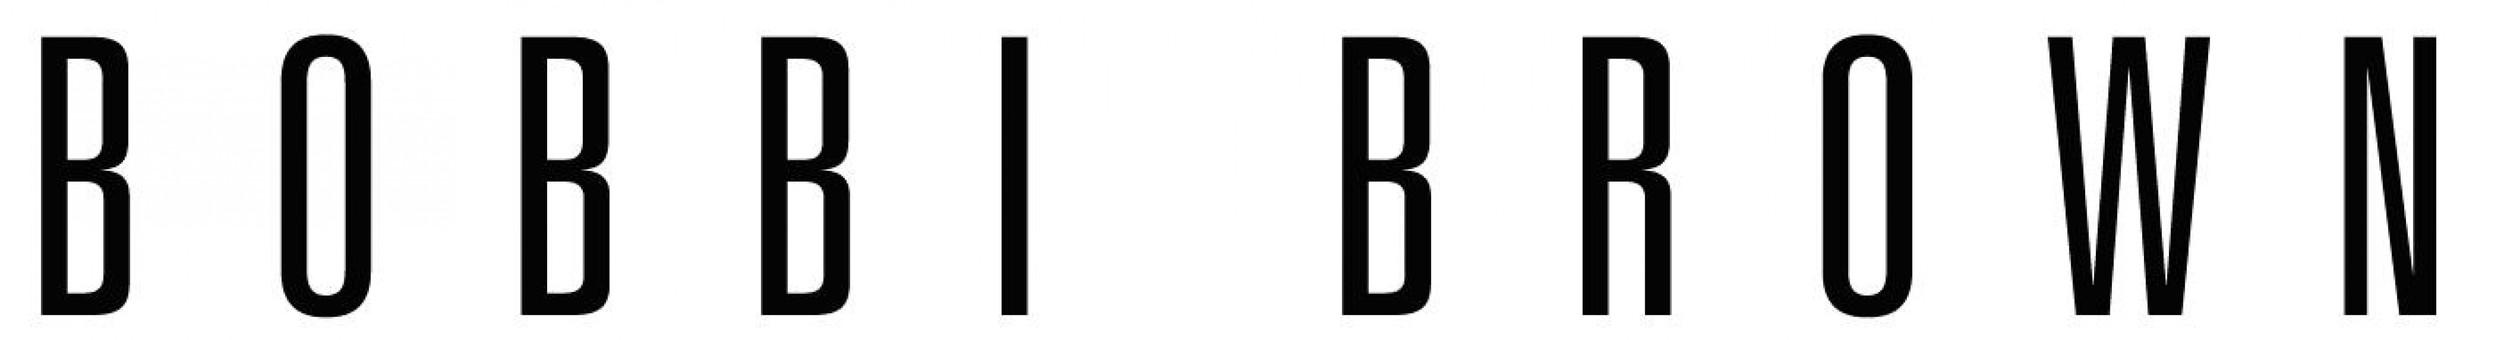 bobbi-logo__large.jpg